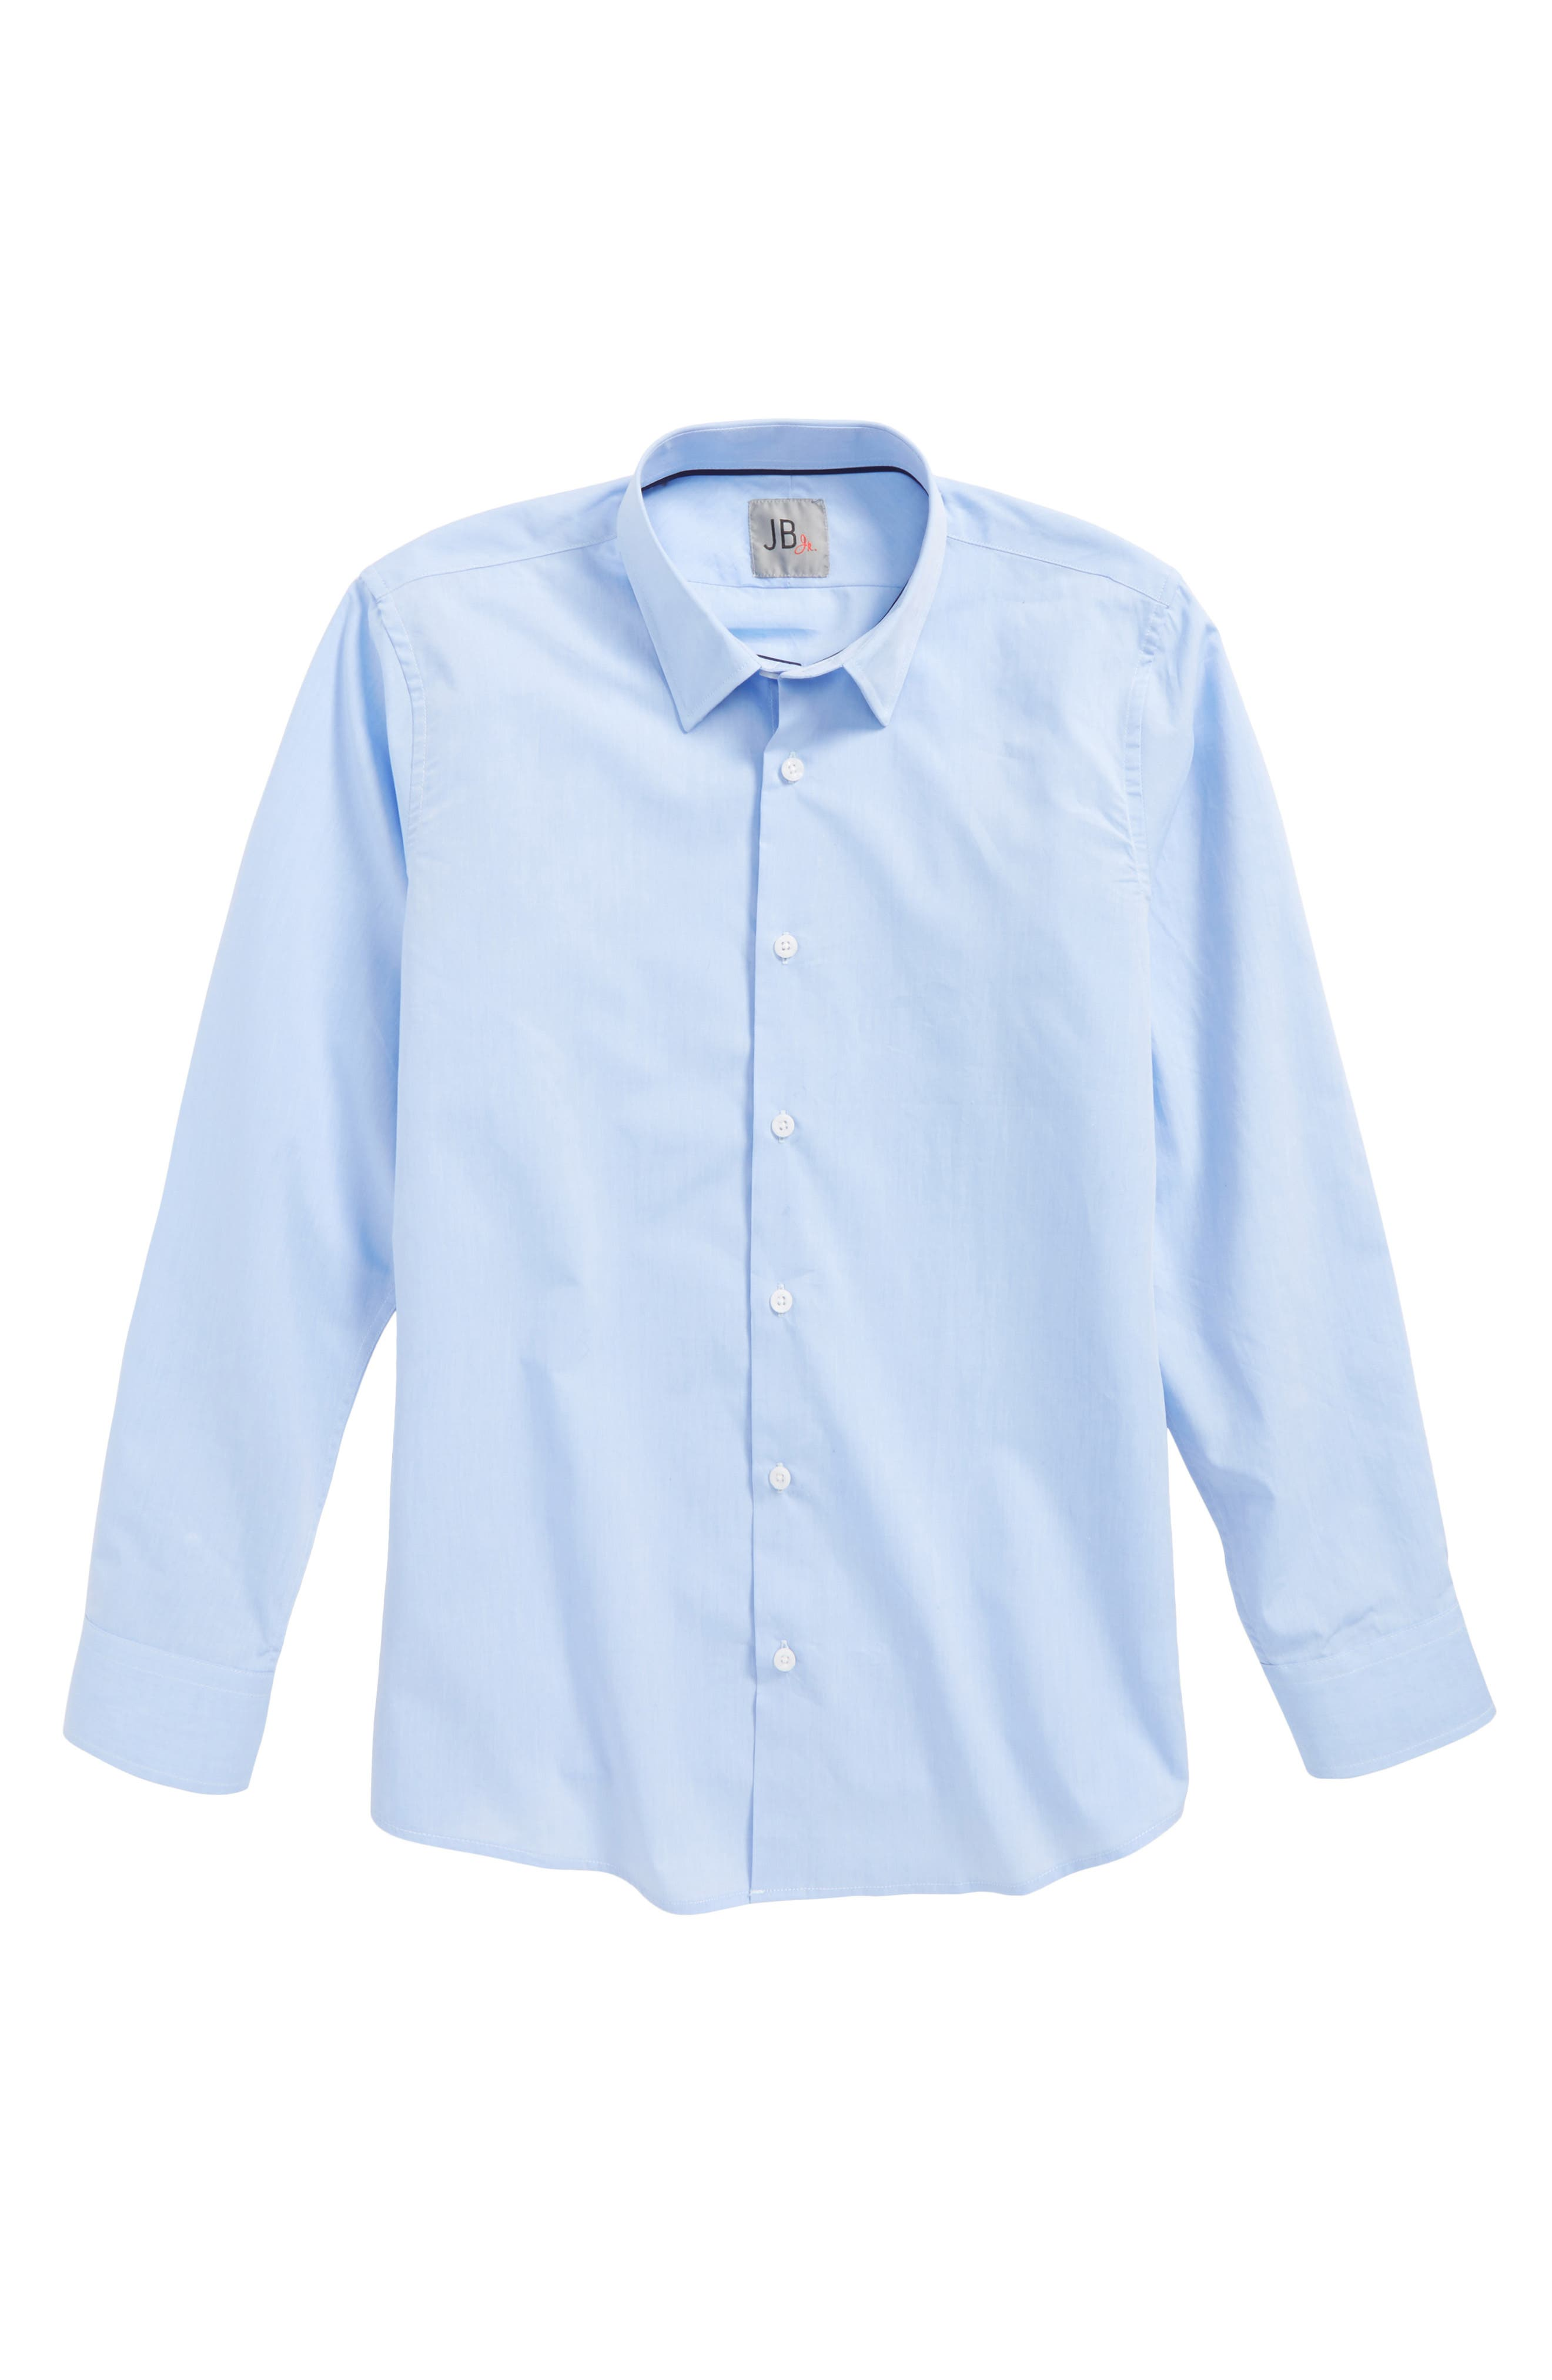 Solid Dress Shirt,                         Main,                         color, 430